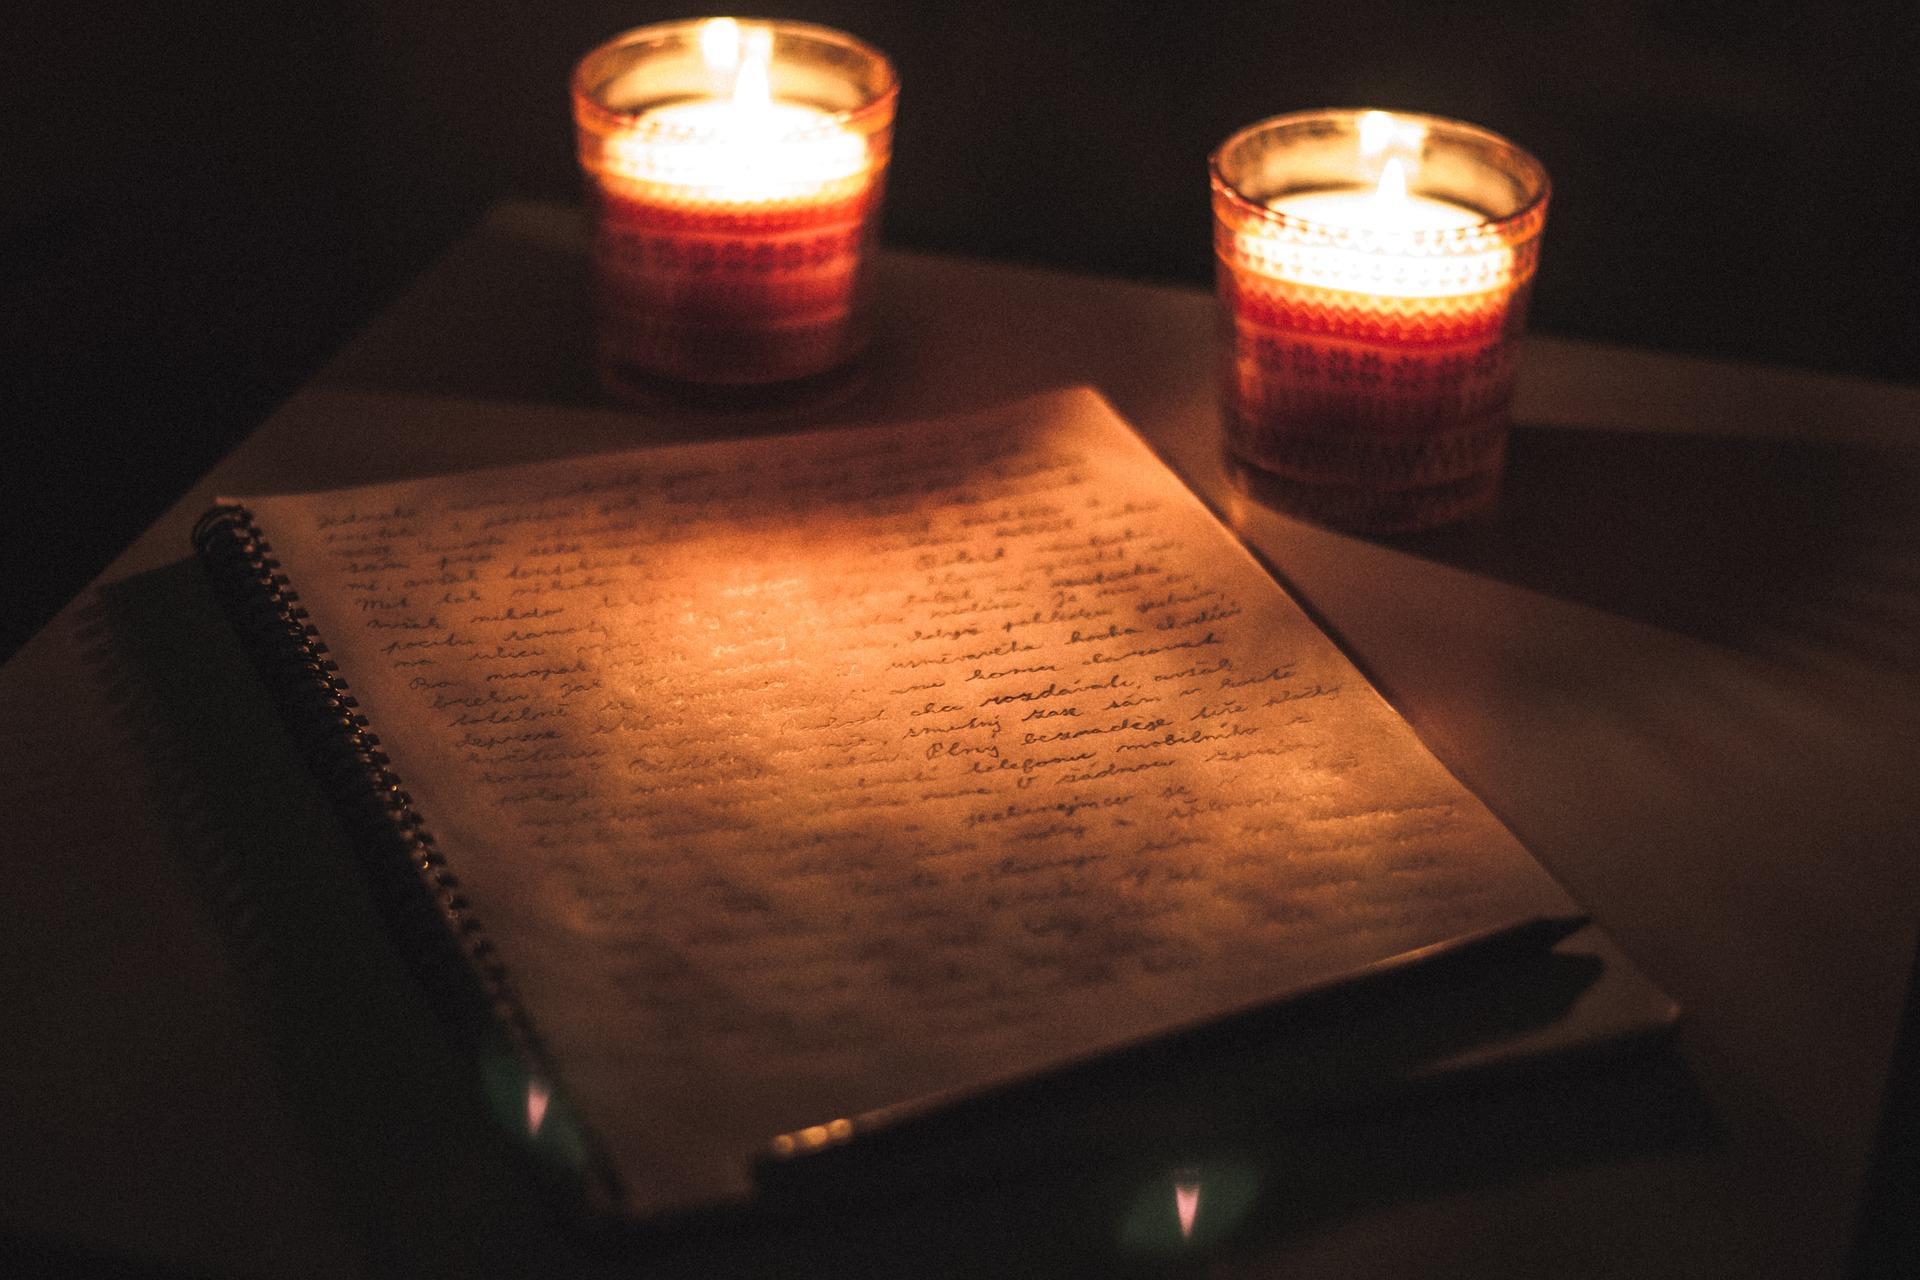 Lettre au Père Noël ©KostkaCZ CC0 Pixabay